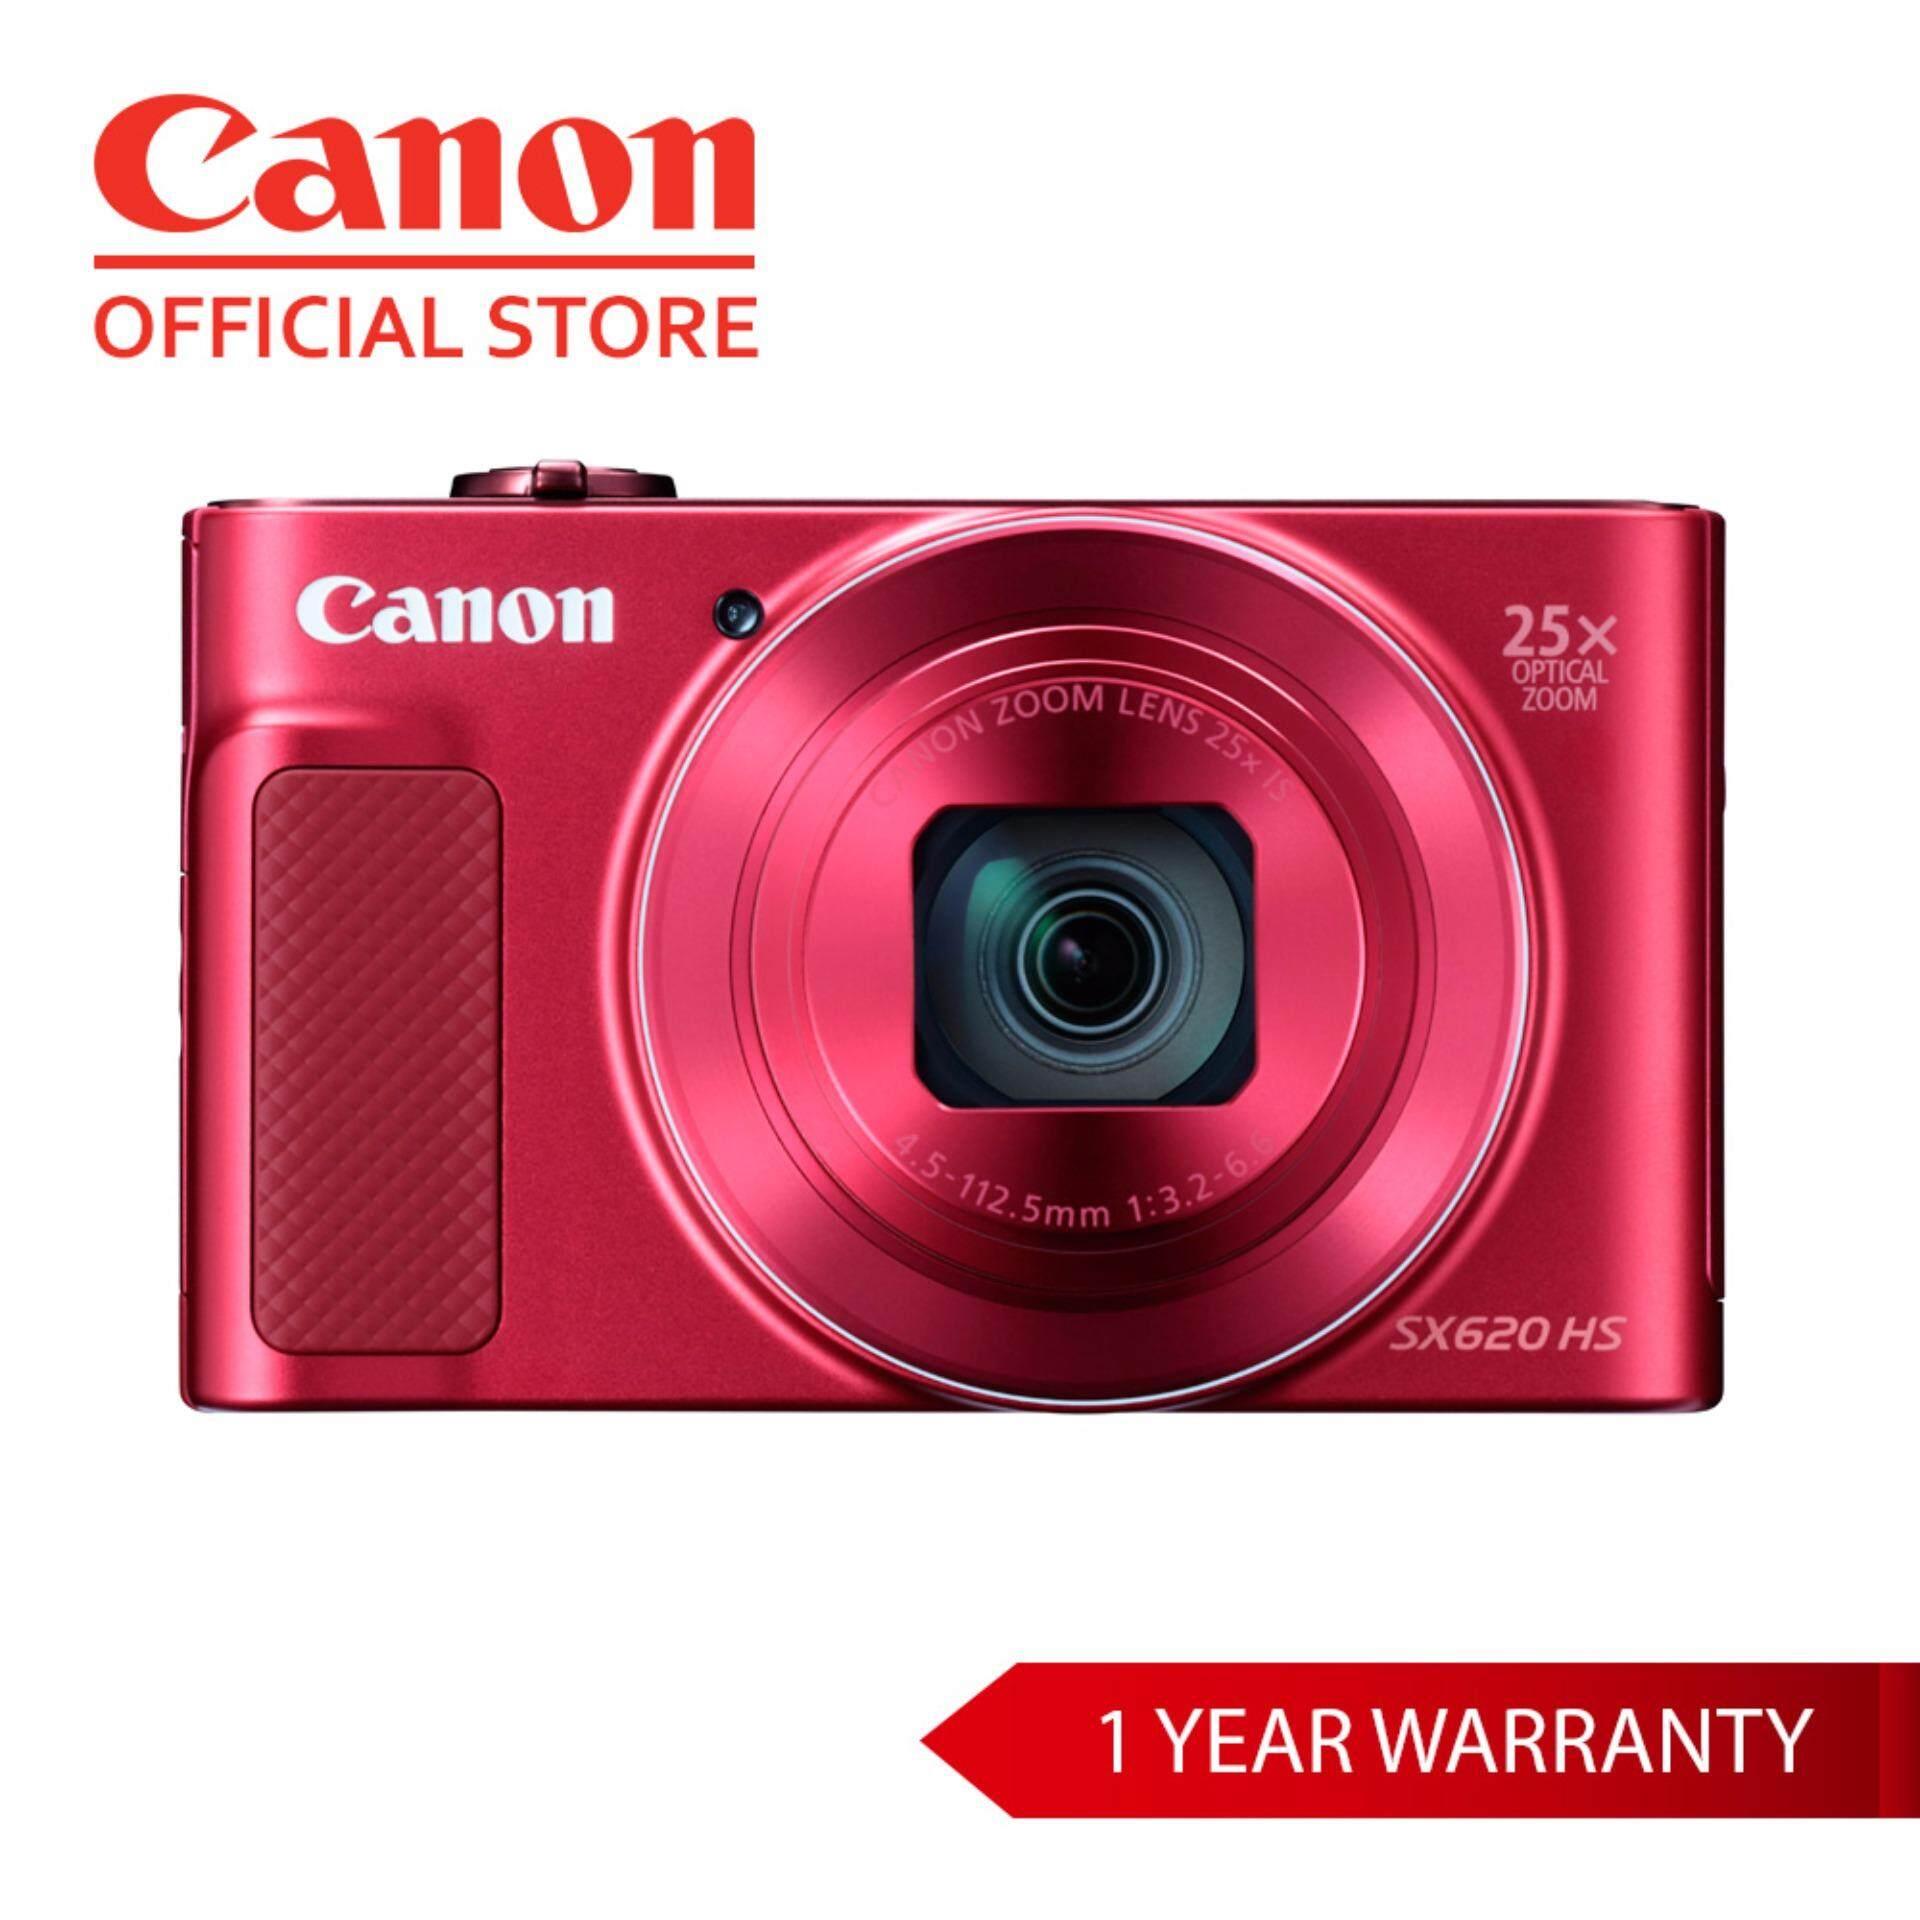 Paghahambing Canon Compact Powershot Sx620hs Camera At Panasonic Lumix Dmc Lx10 Digital Black 4k Advance Creative